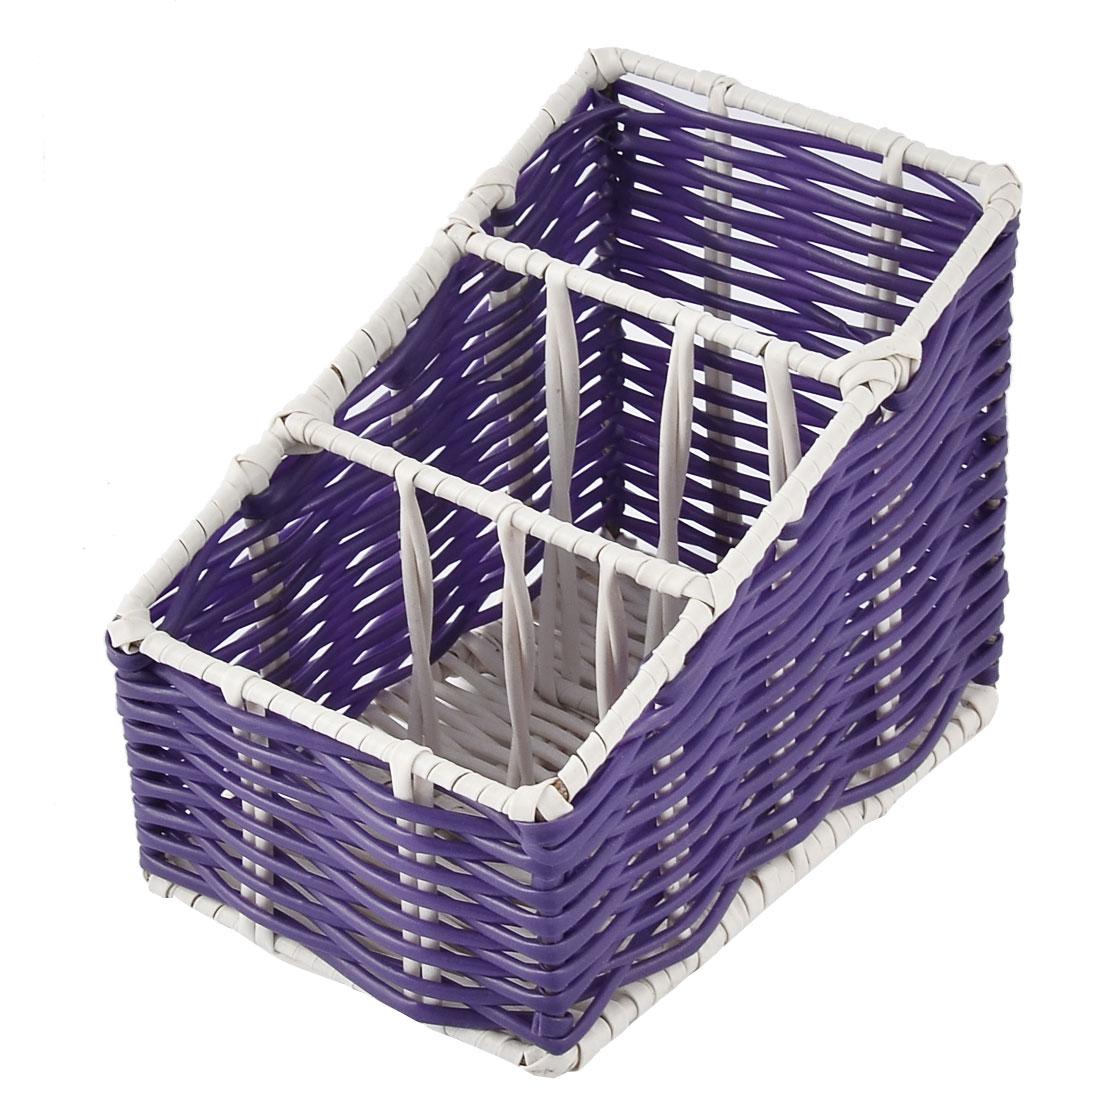 Kitchen Desk Household Plastic 3 Grids Woven Organizer Storage Box Case Basket Purple